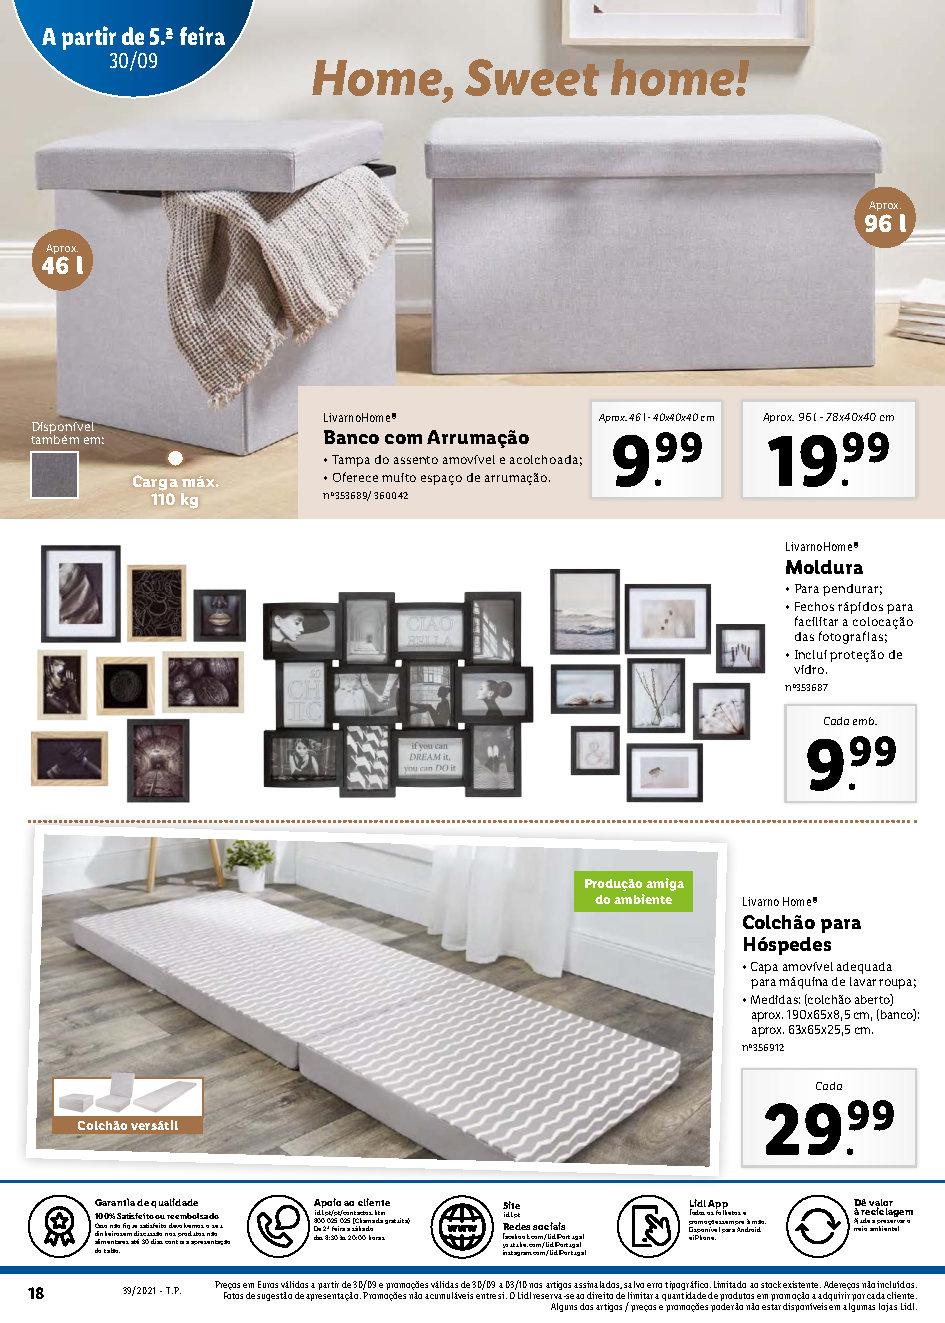 folheto lidl bazar promocoes descontos 27 setembro 3 outubro Page18